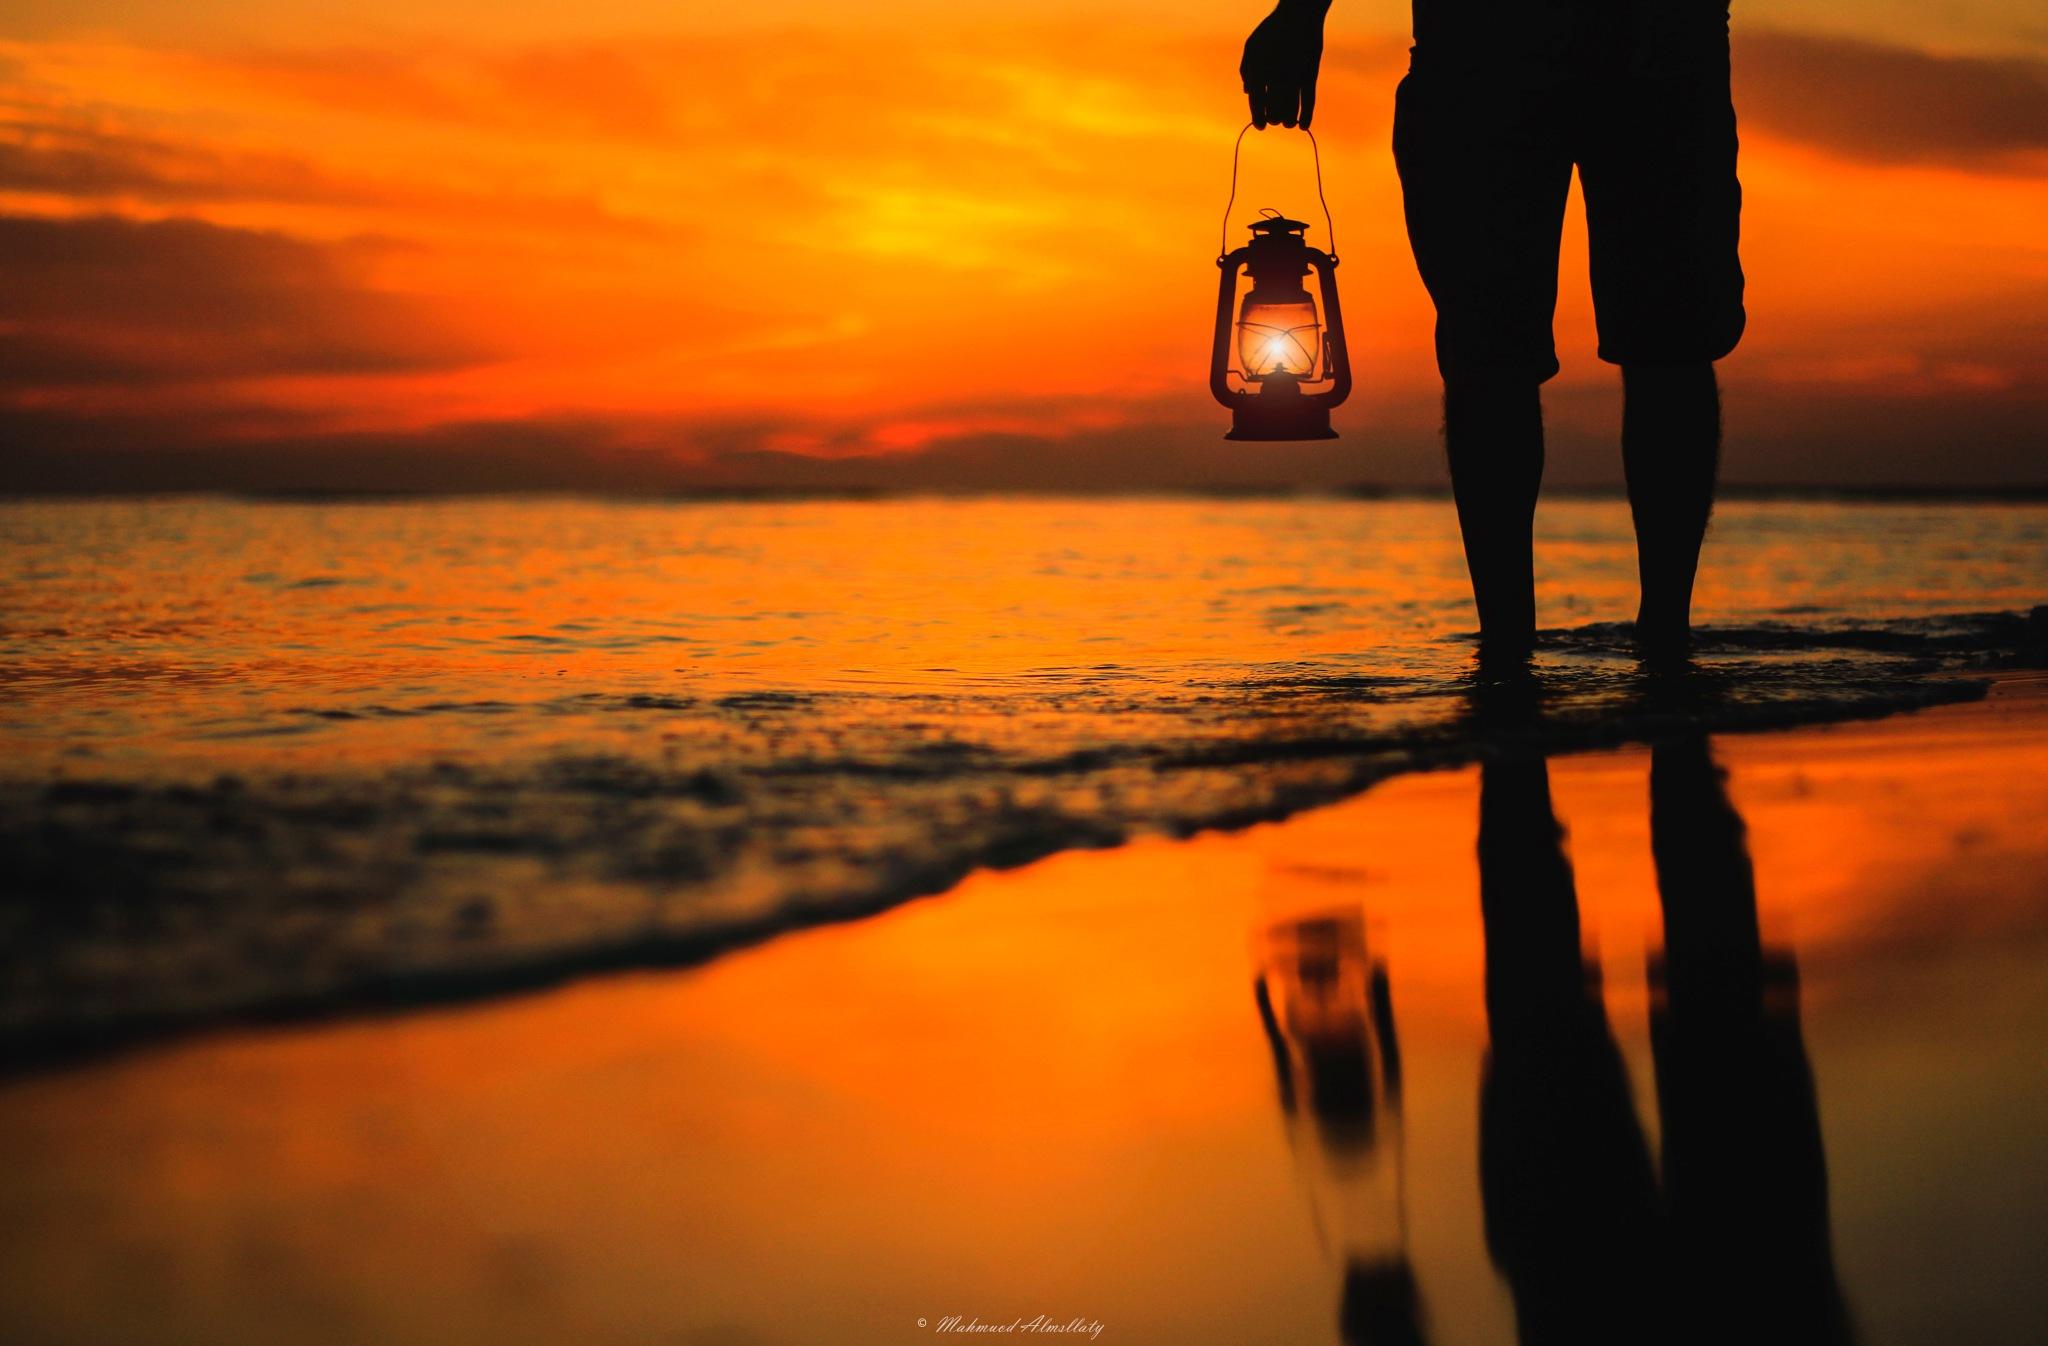 Silhouette by Mahmuod Almsllaty